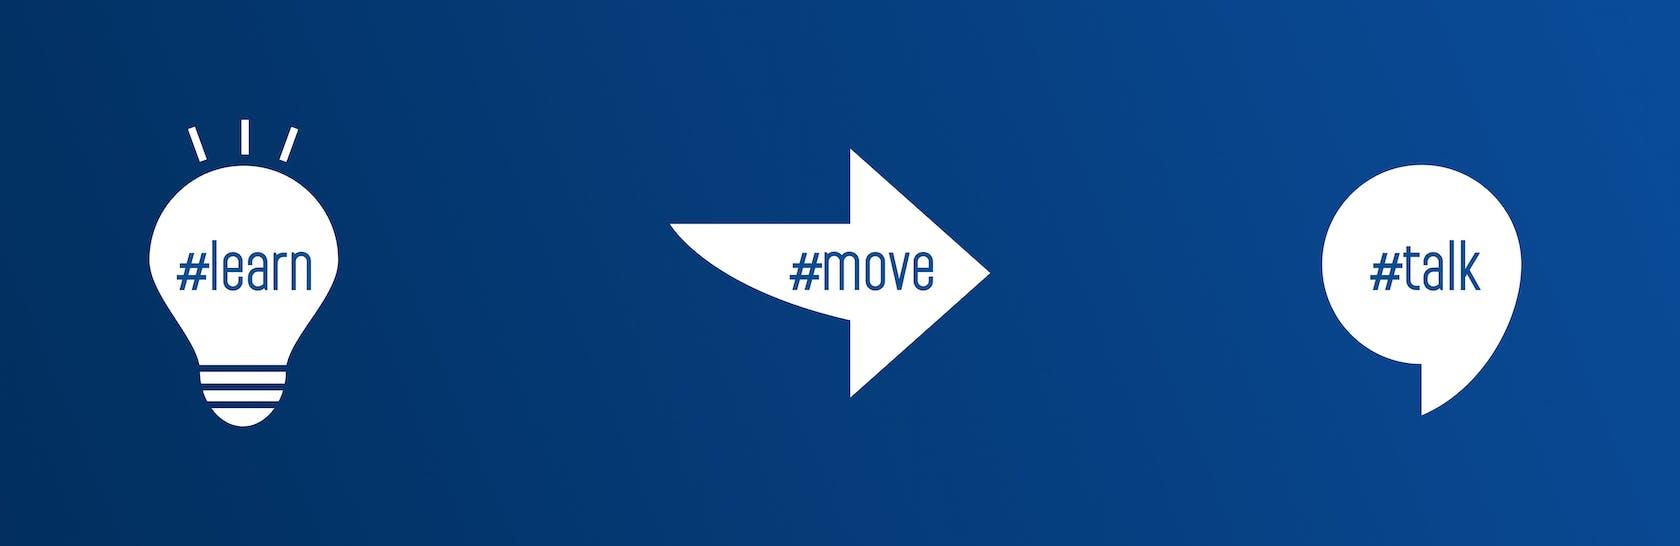 #learn #move #talk